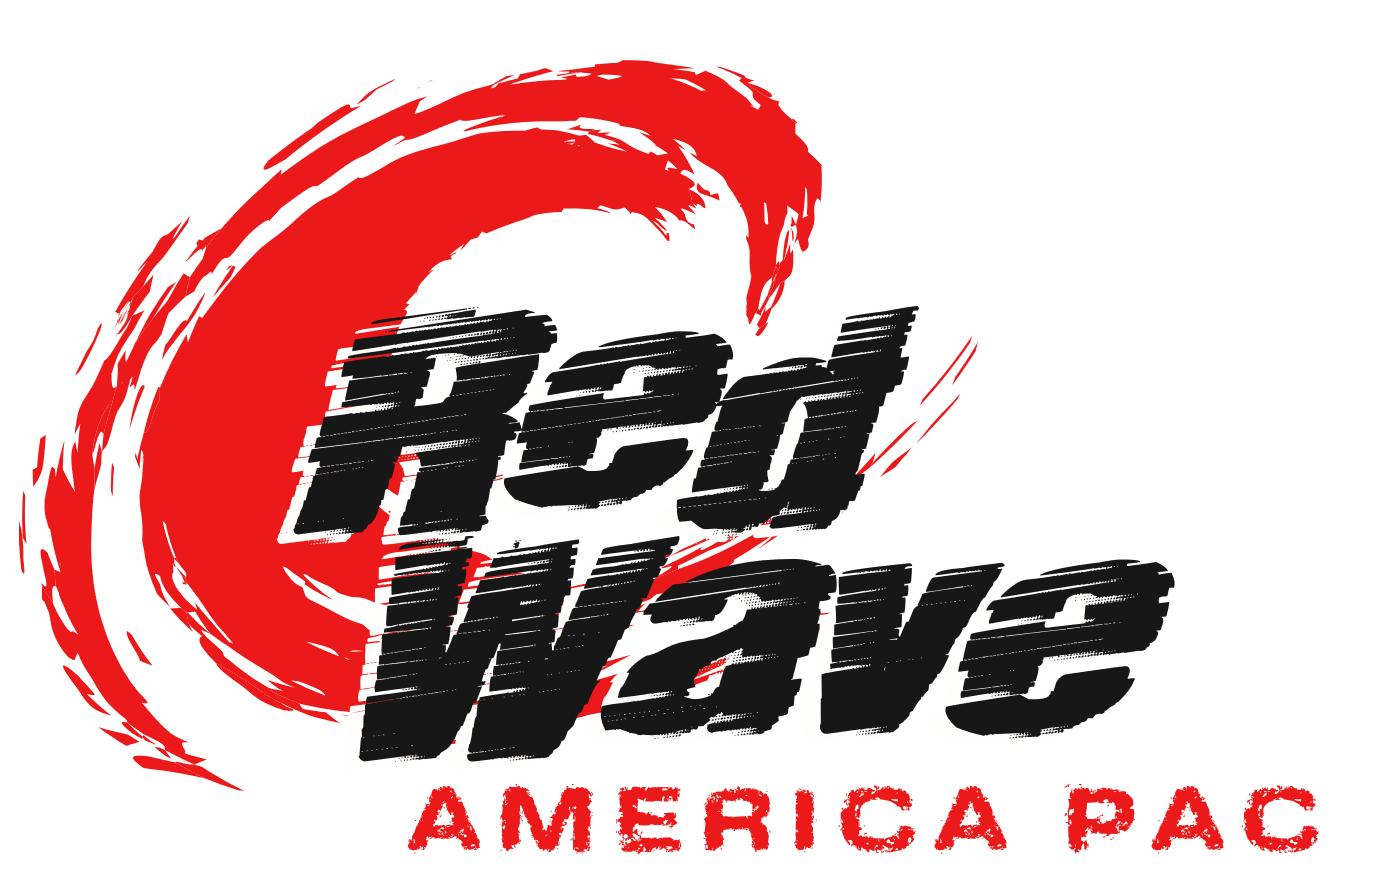 Redwave america pac